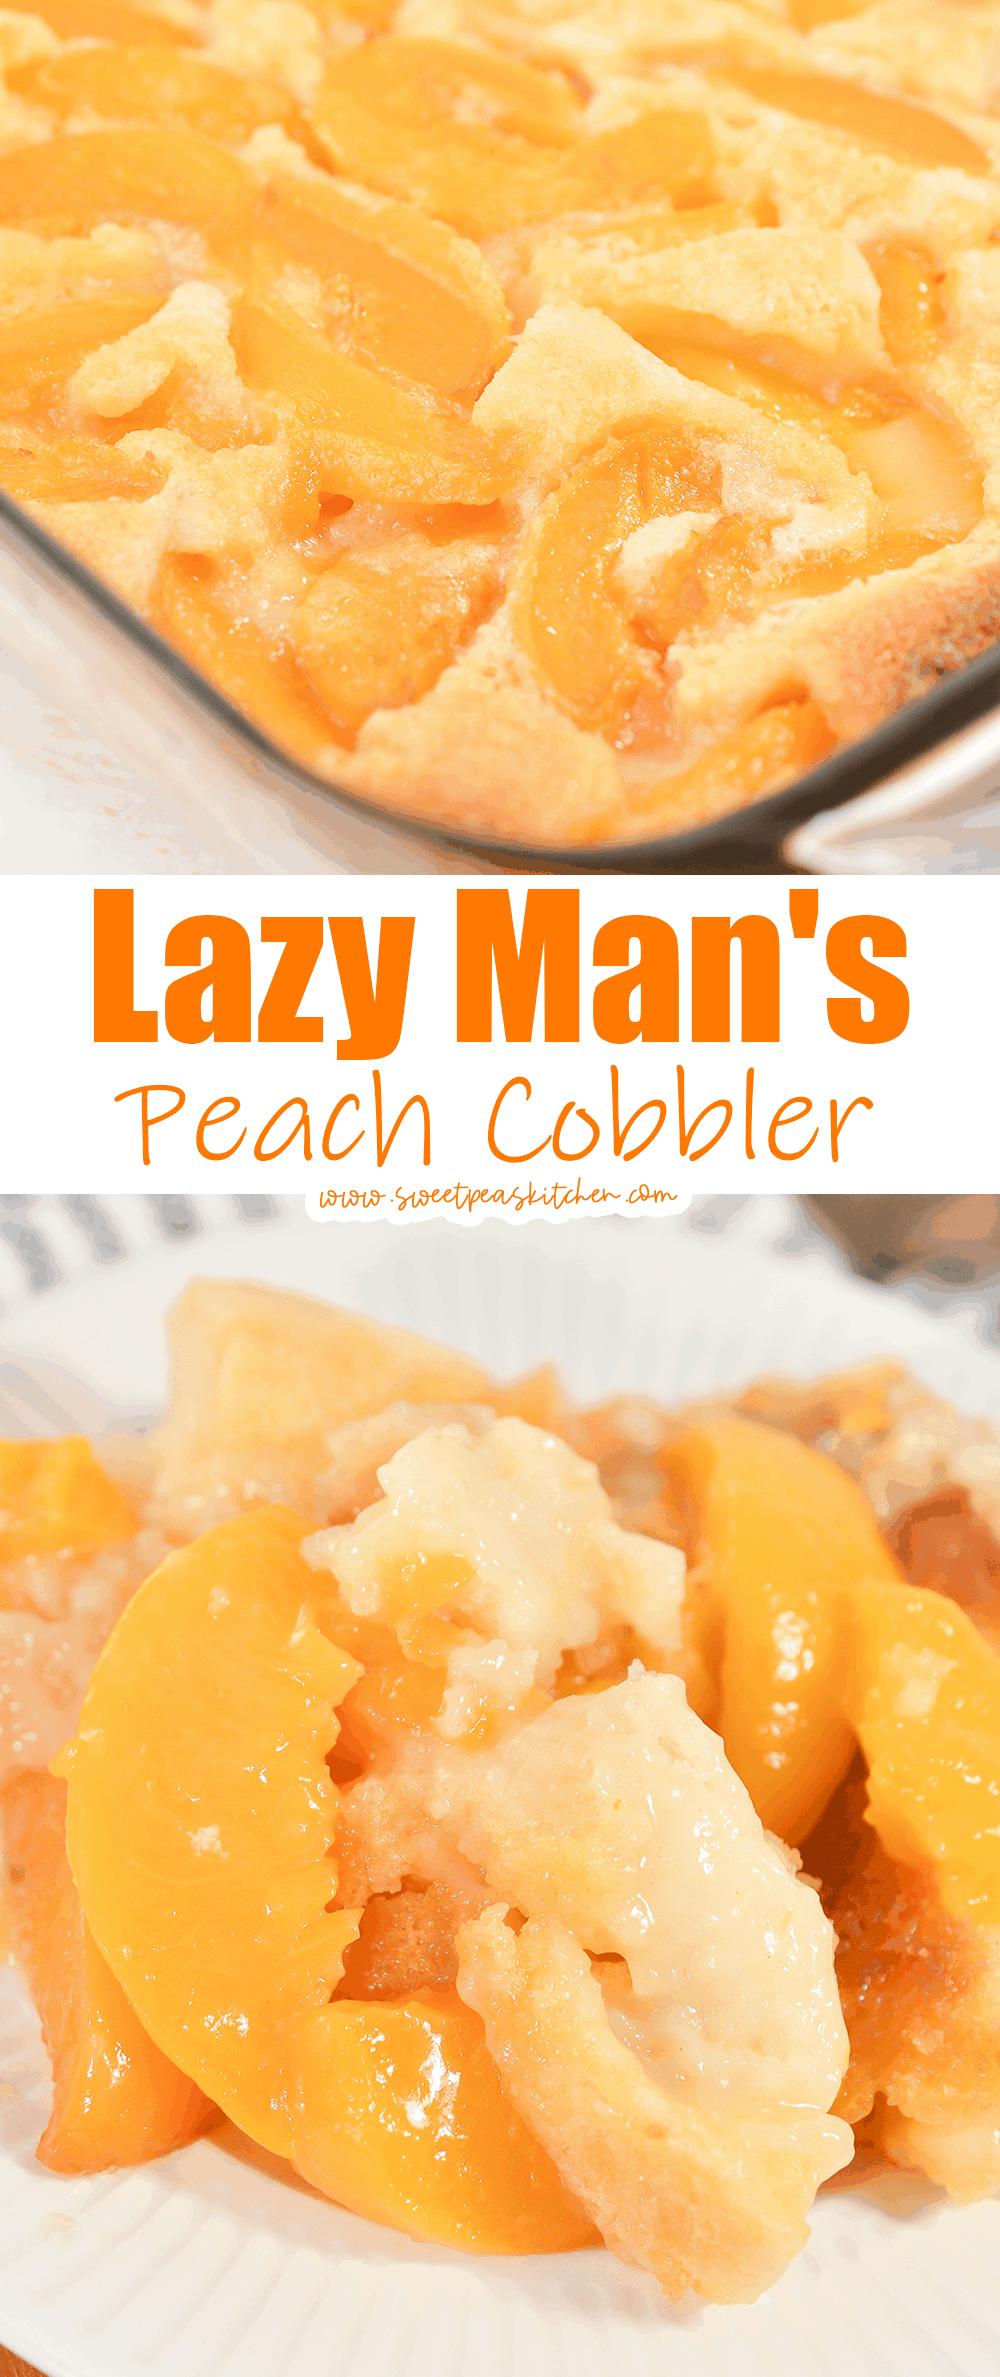 Lazy Man's Peach Cobbler